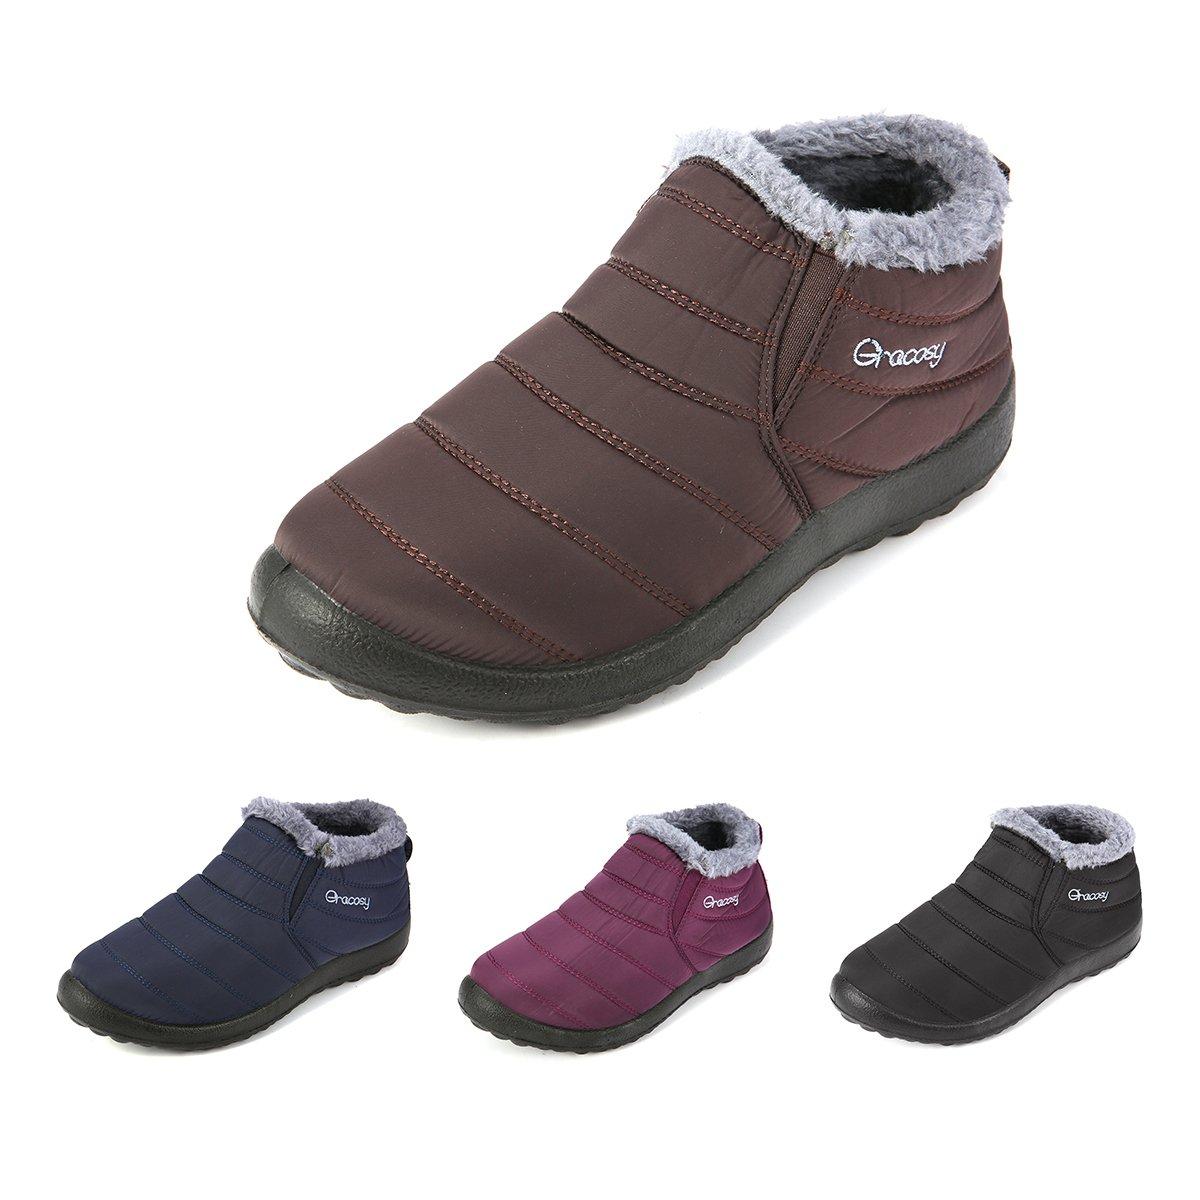 gracosy Women Snow Boots Winter Warm Fur Lining Slip On Flat Ankle Shoes Anti Slip Waterproof Outdoor B01NAGM39X 6 M US|Coffee